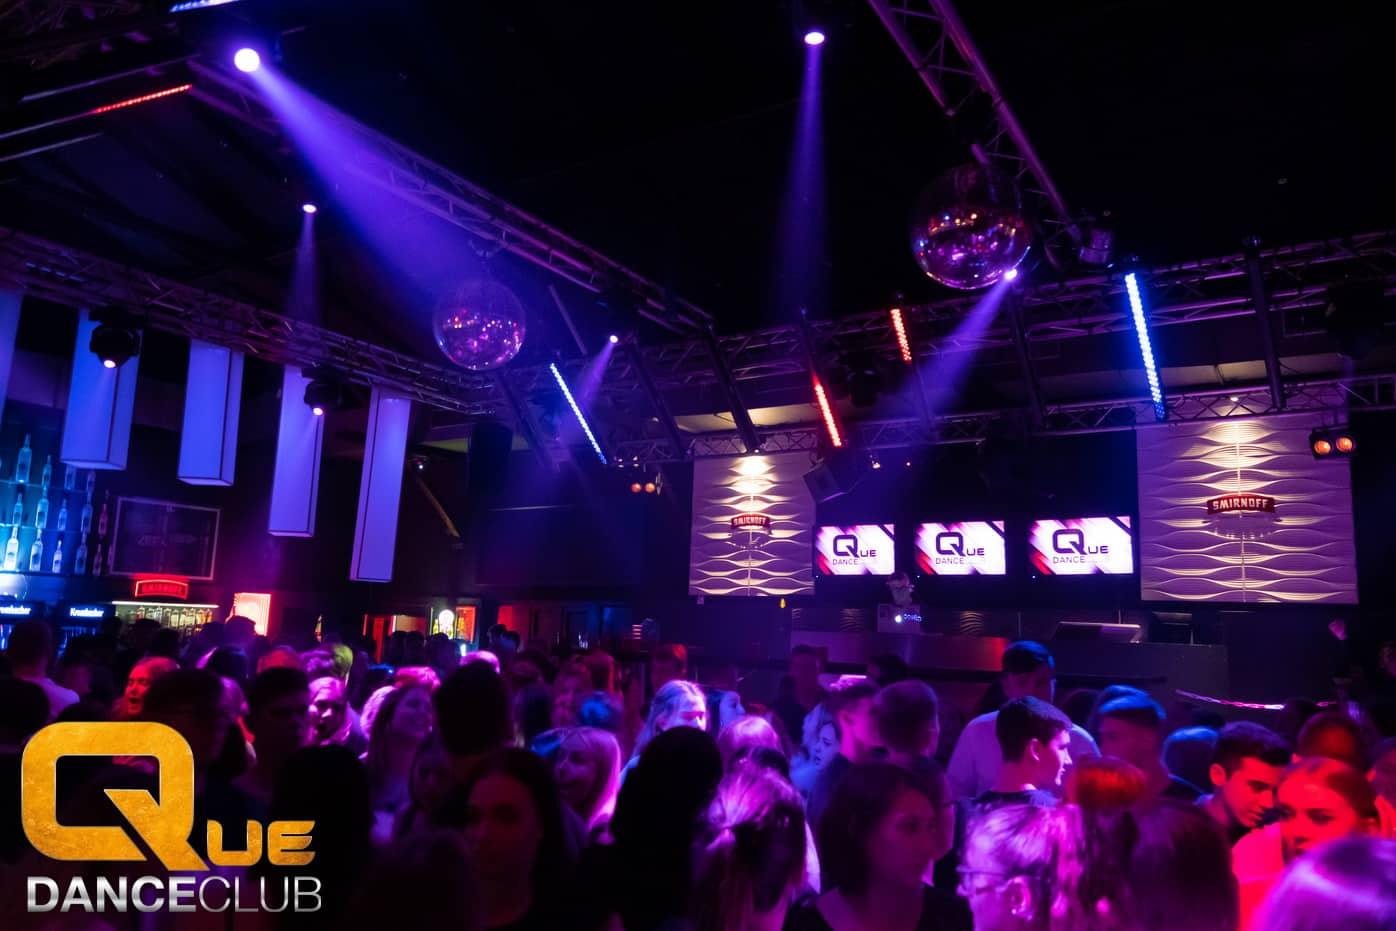 2018_12_20_Que_Danceclub_XMAS_Abiparty_United_Nightlife_Scene_Timo_033